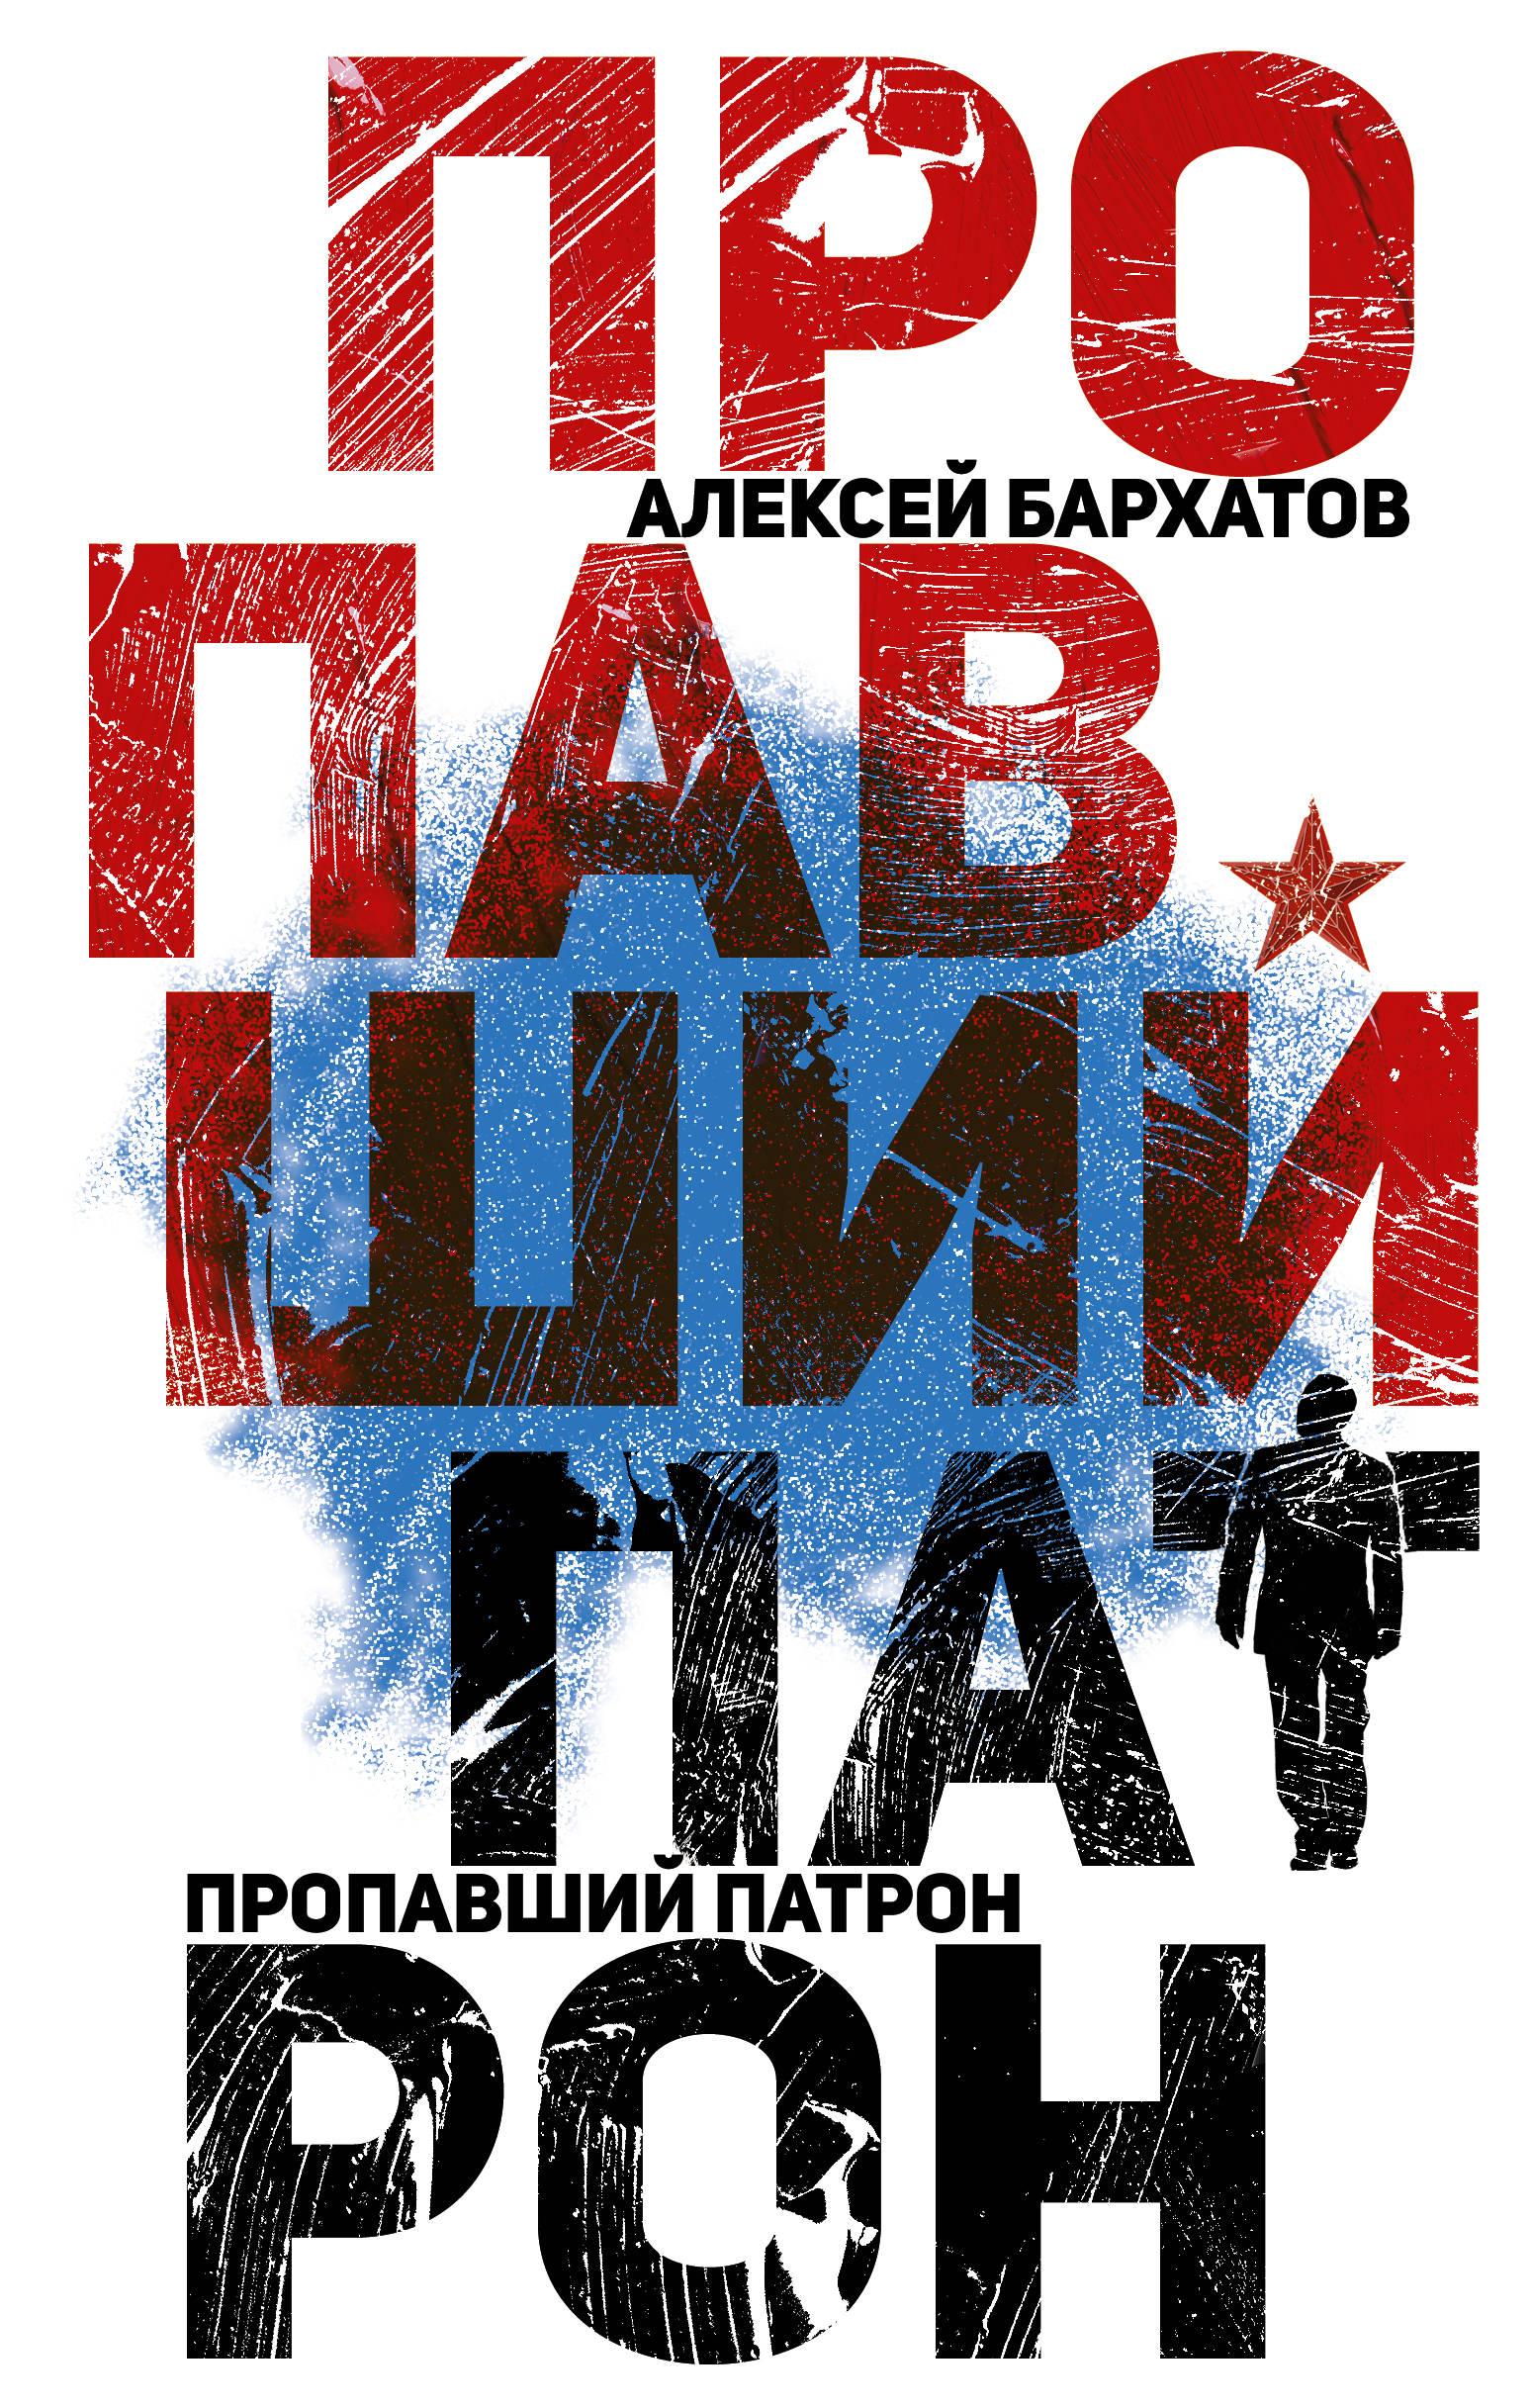 Бархатов Алексей Александрович Пропавший патрон